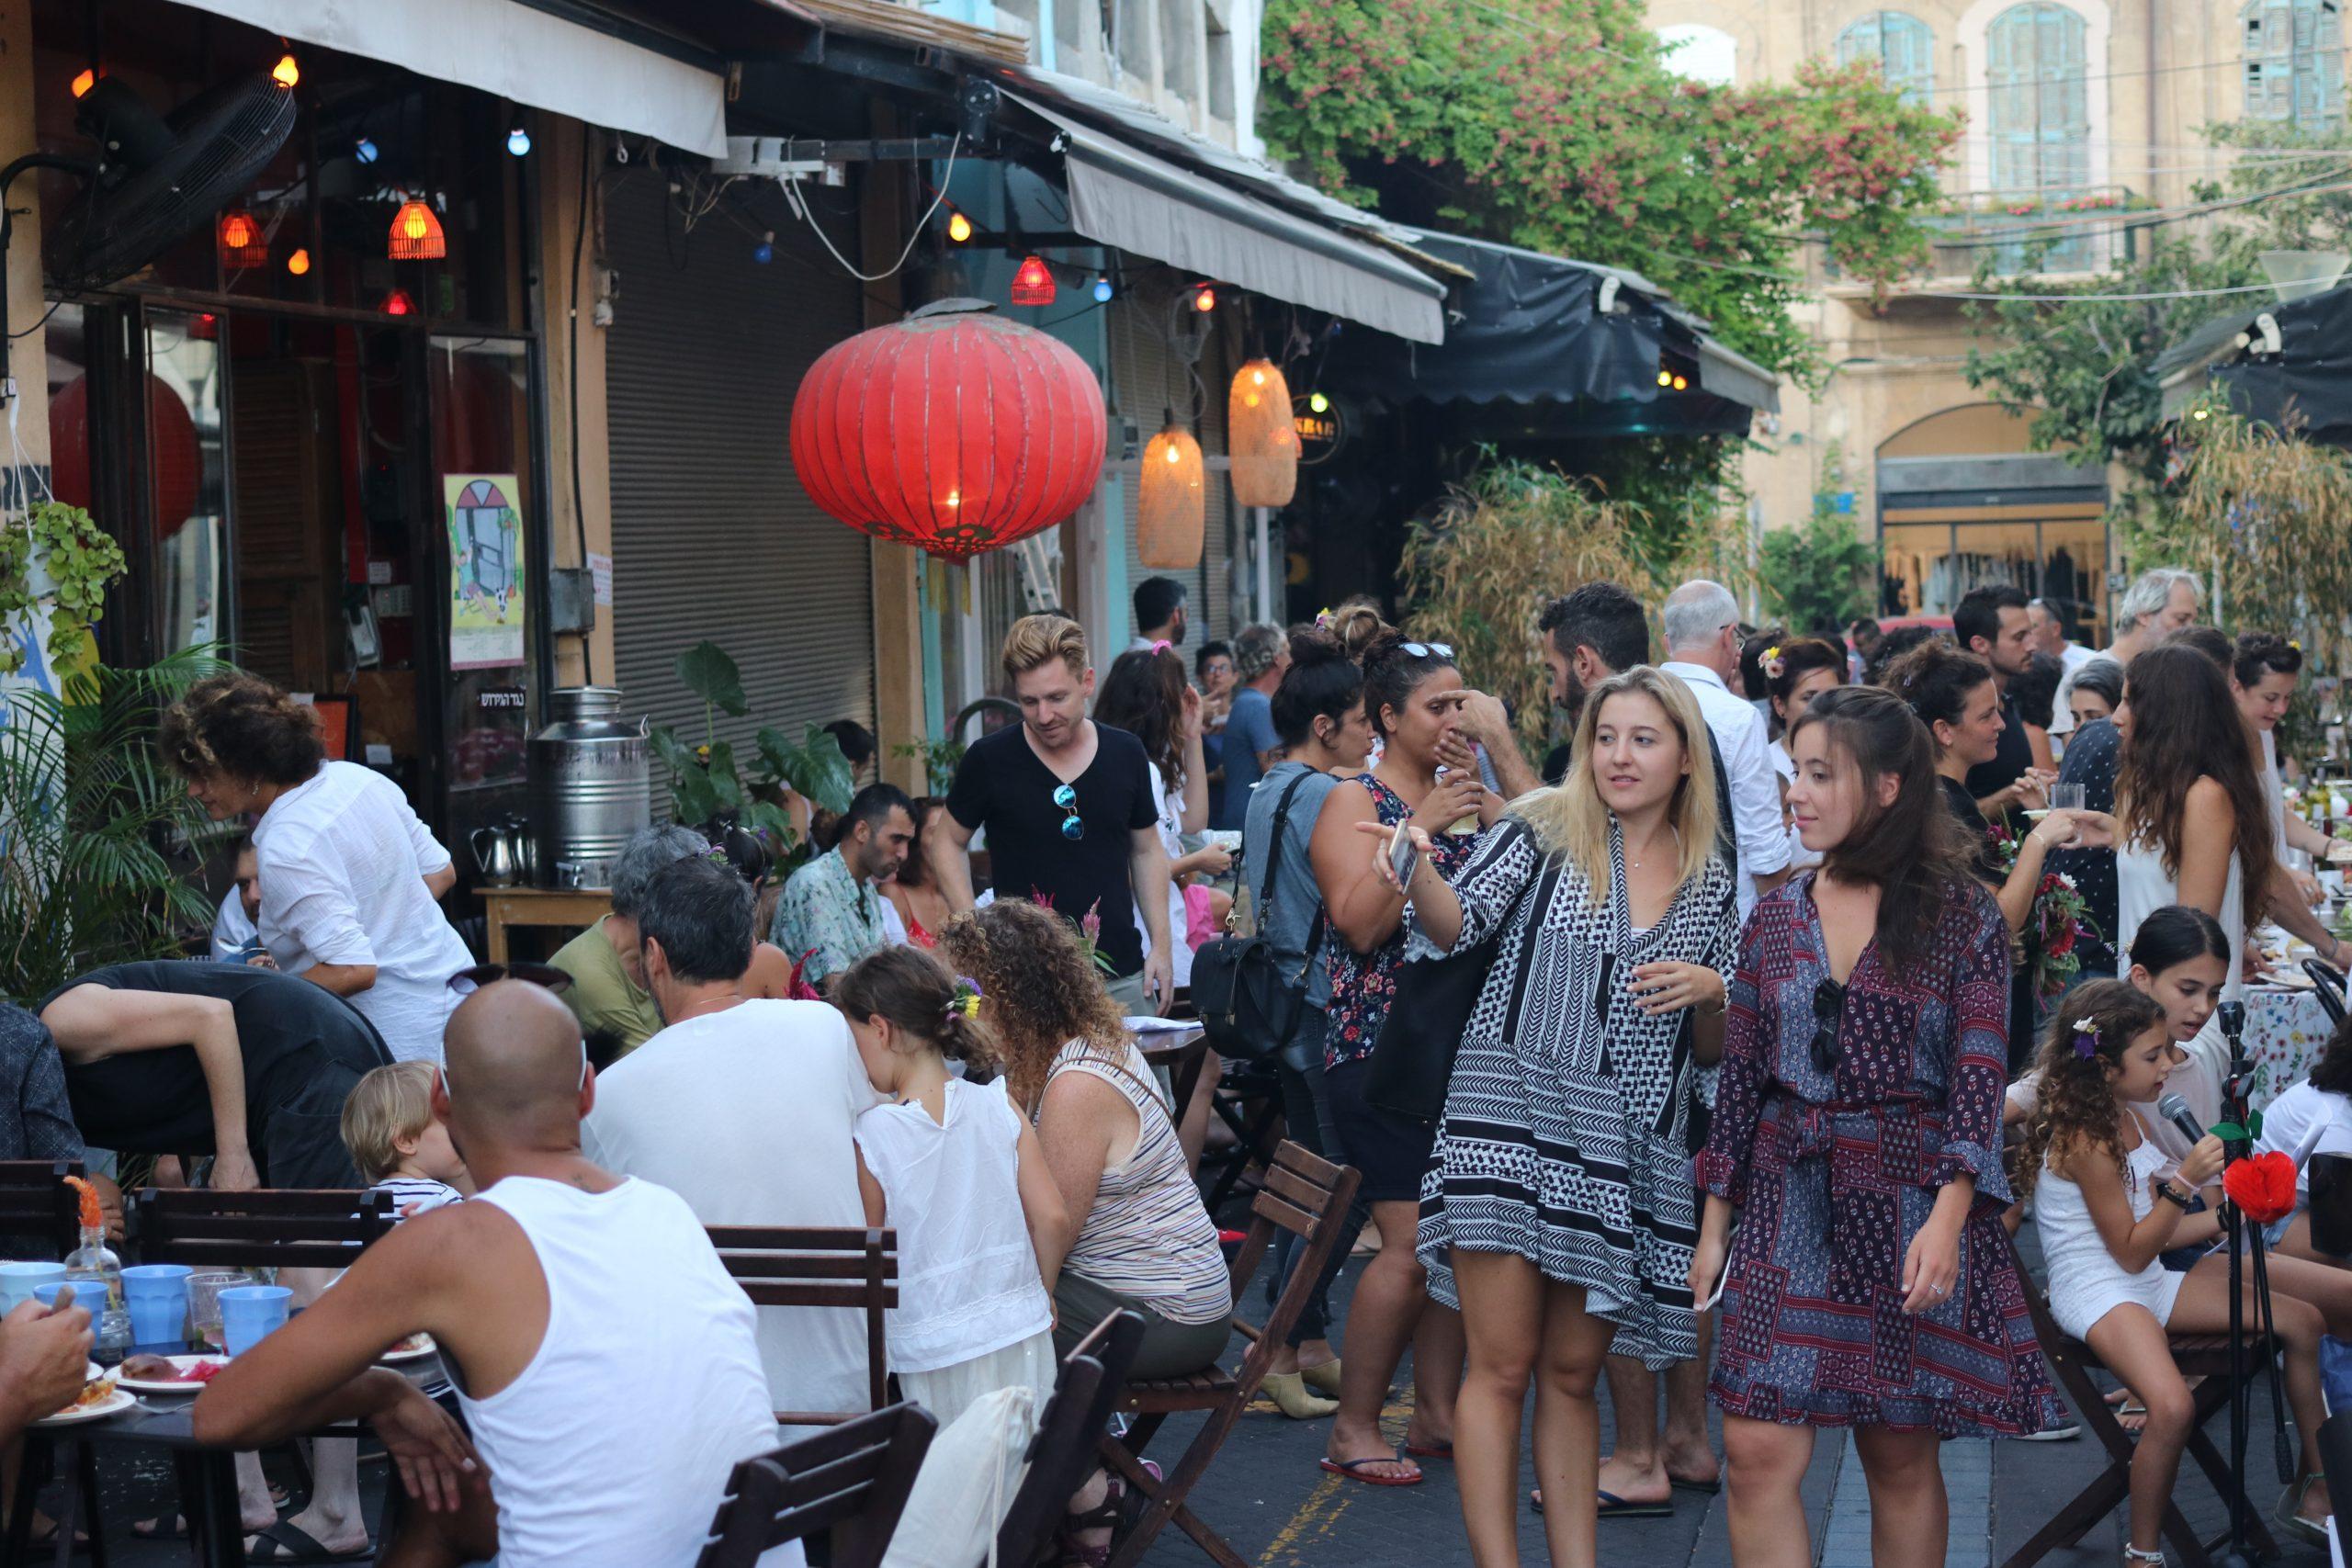 Street Photography: Birthday Party